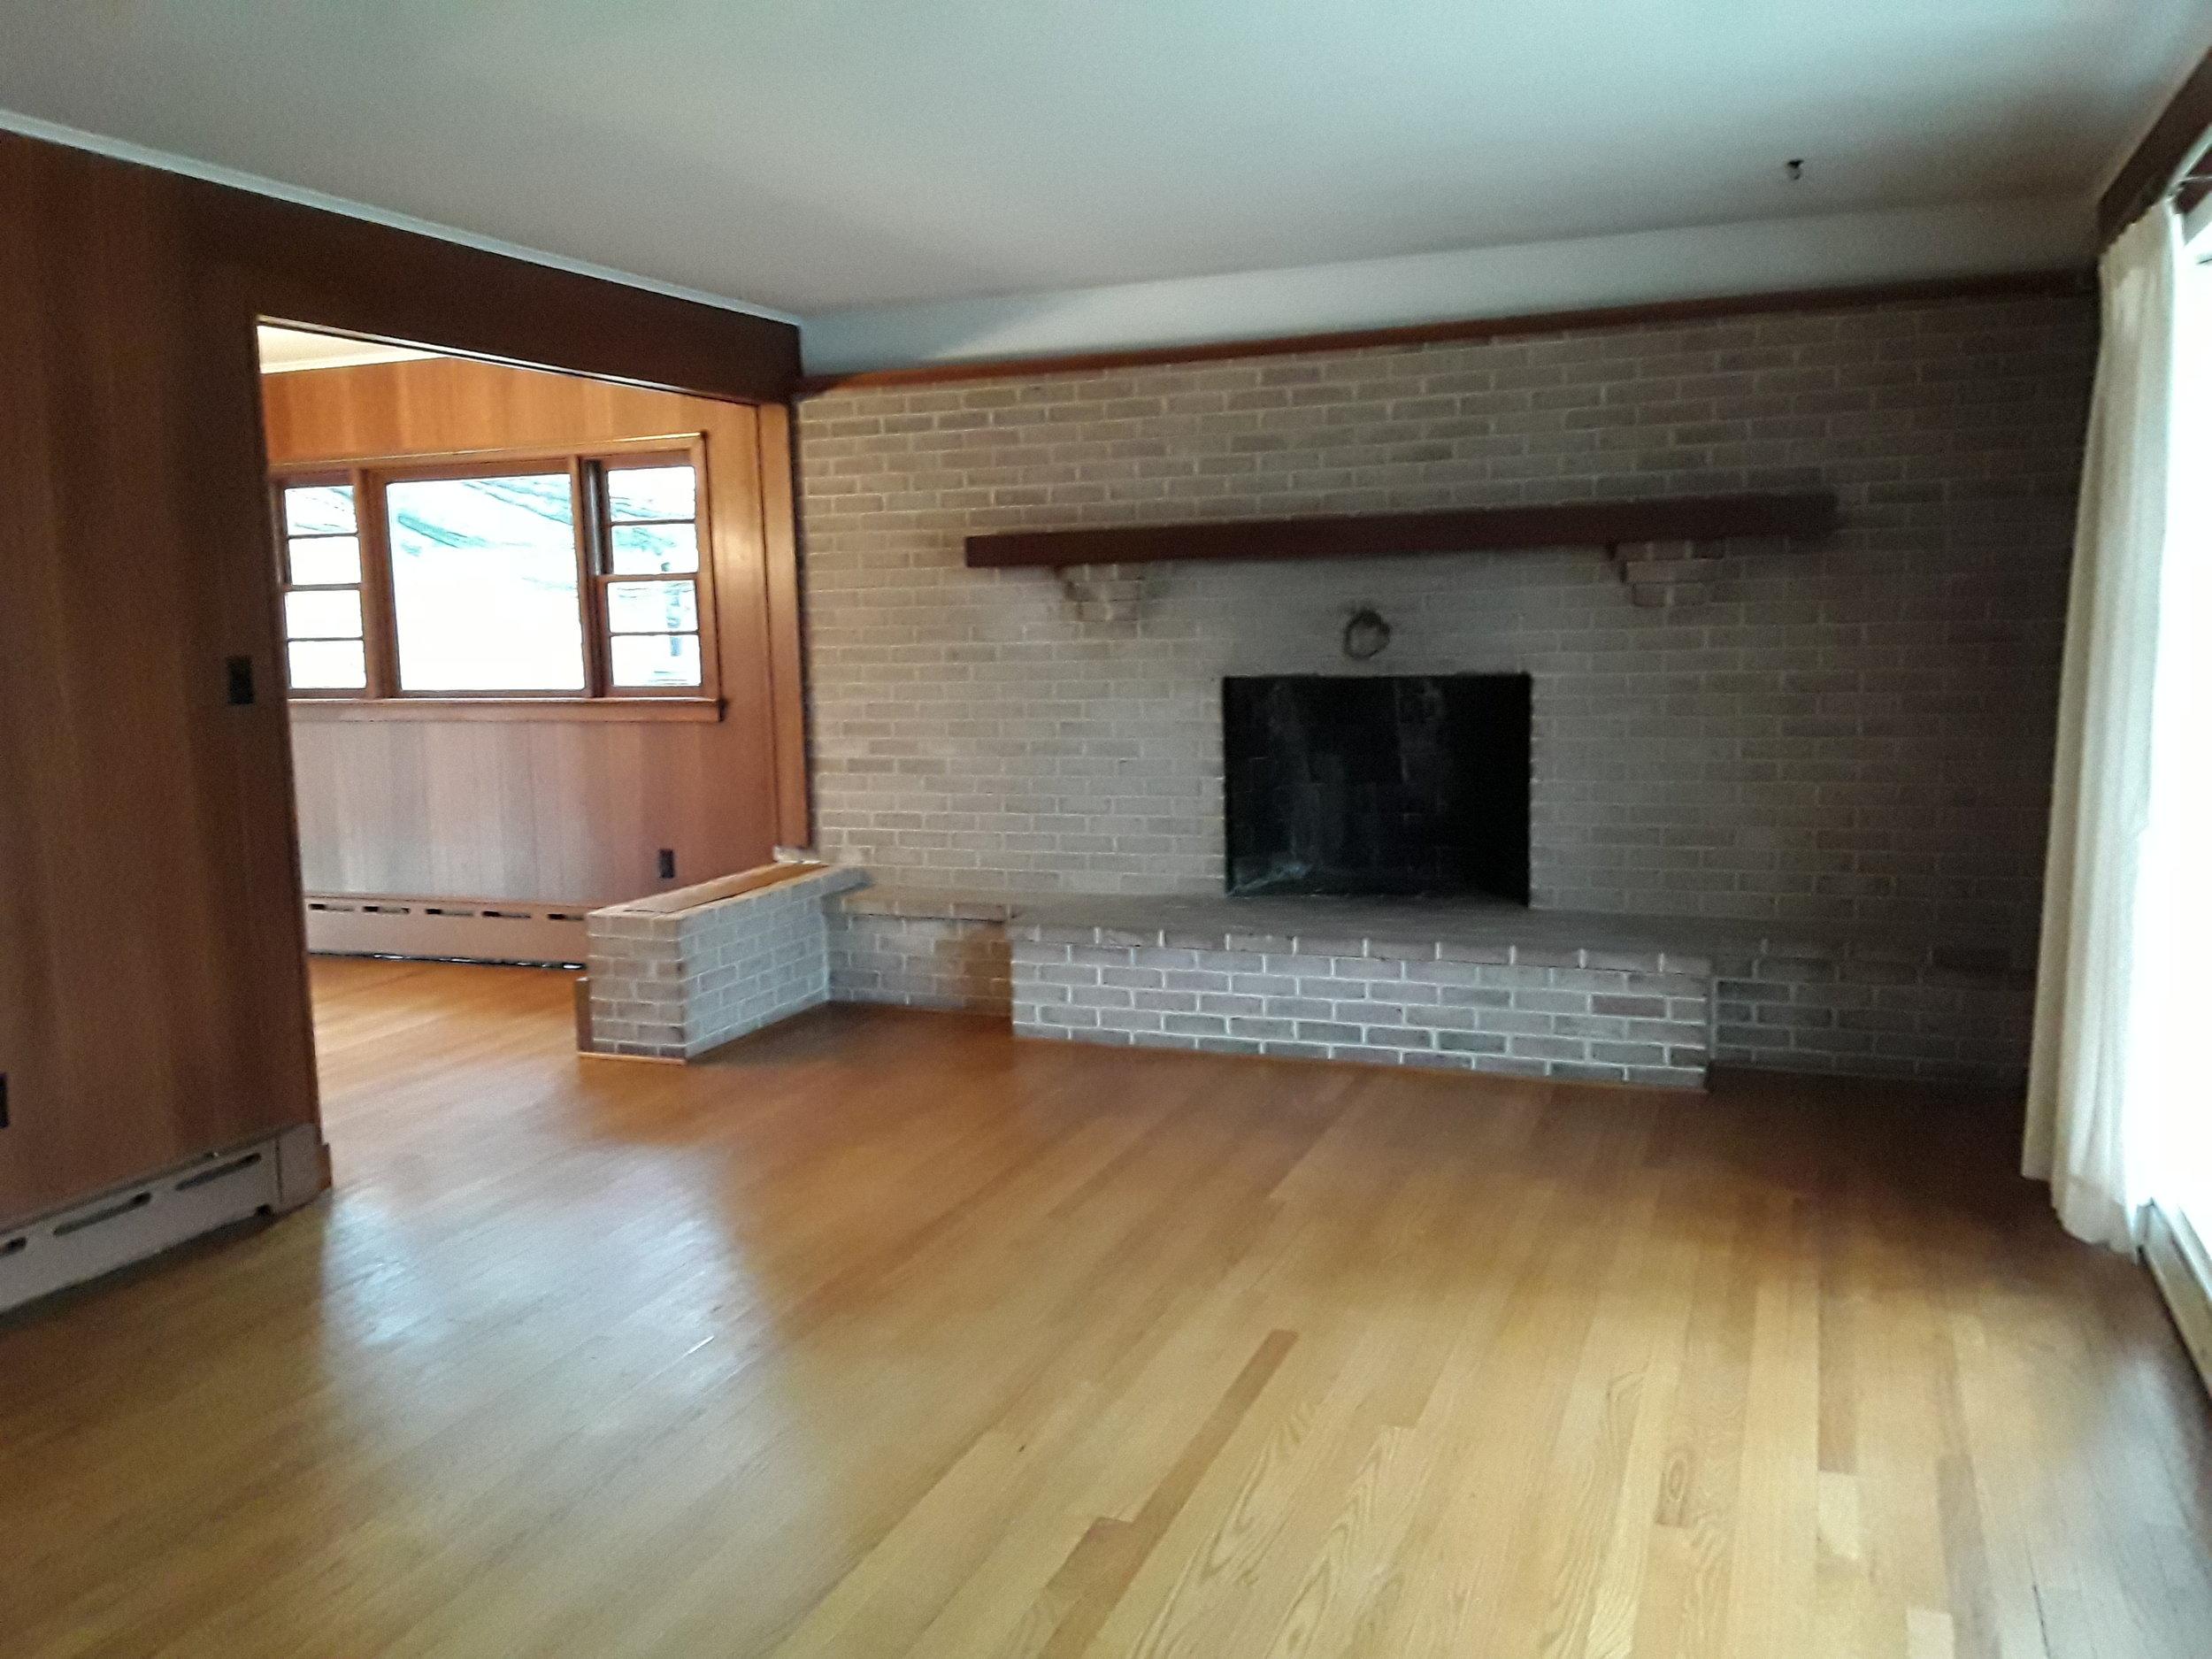 before_living room fireplace.jpg